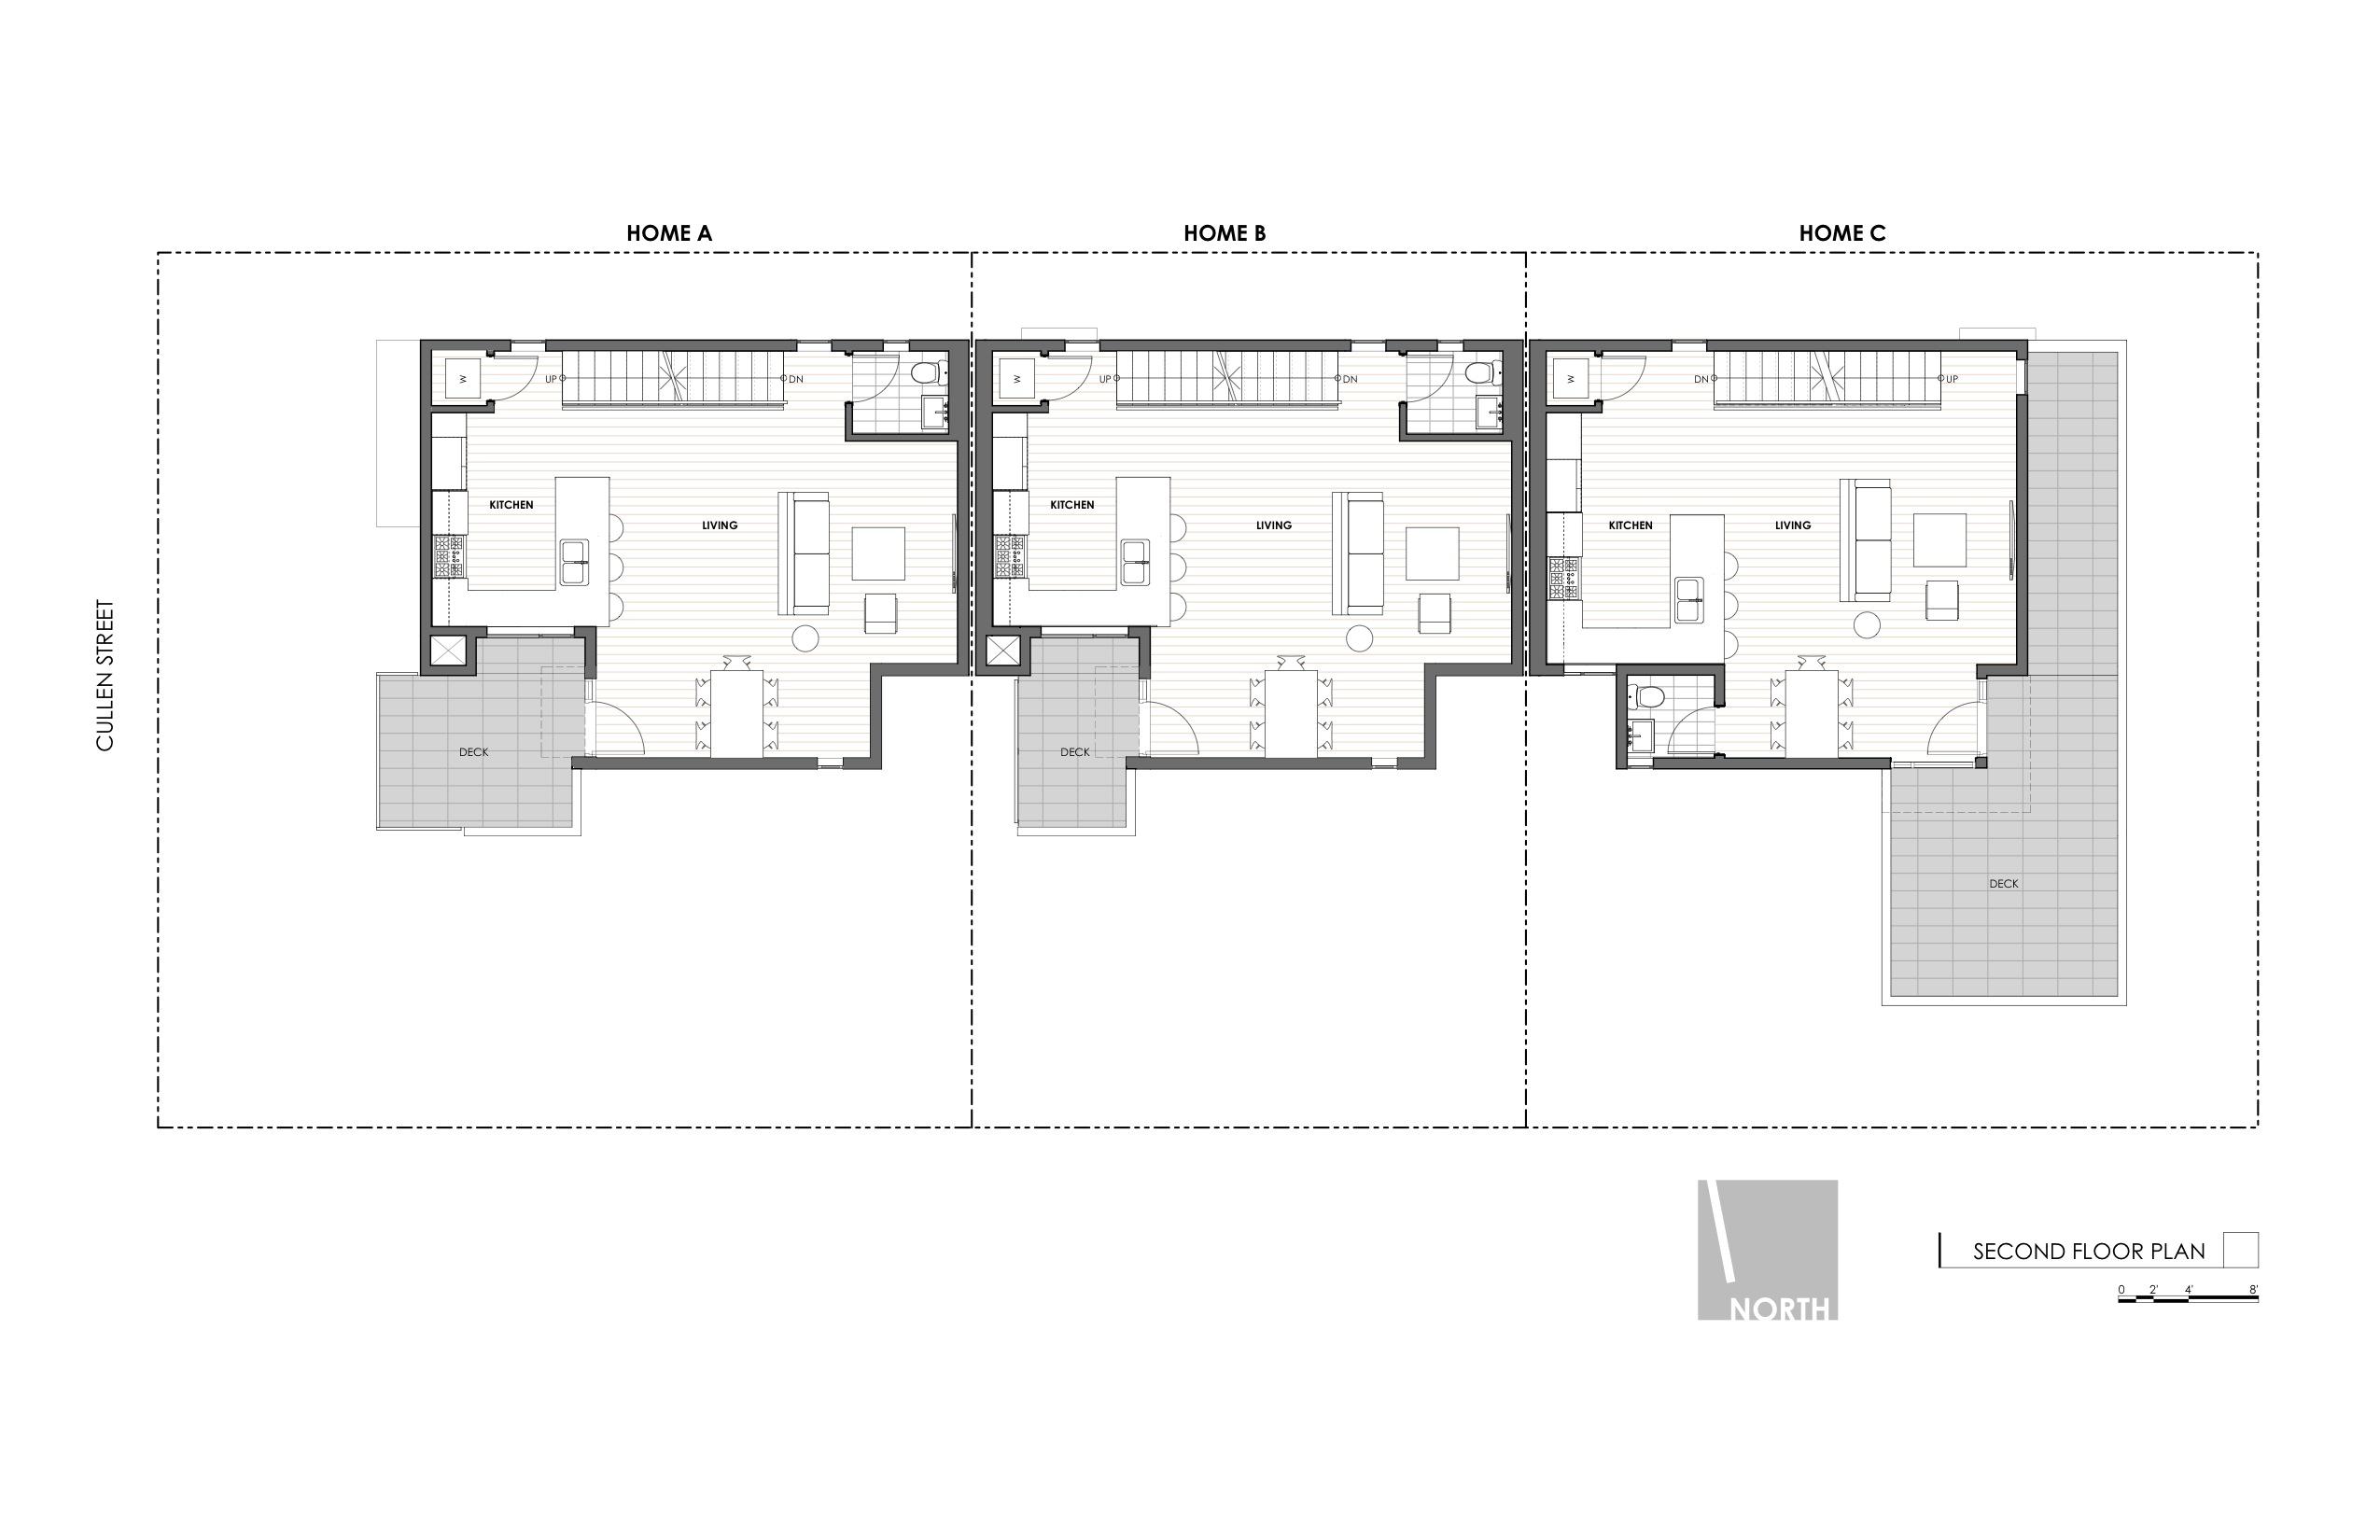 Cullen house floor plan 28 images cullens house floor for Twilight house floor plan